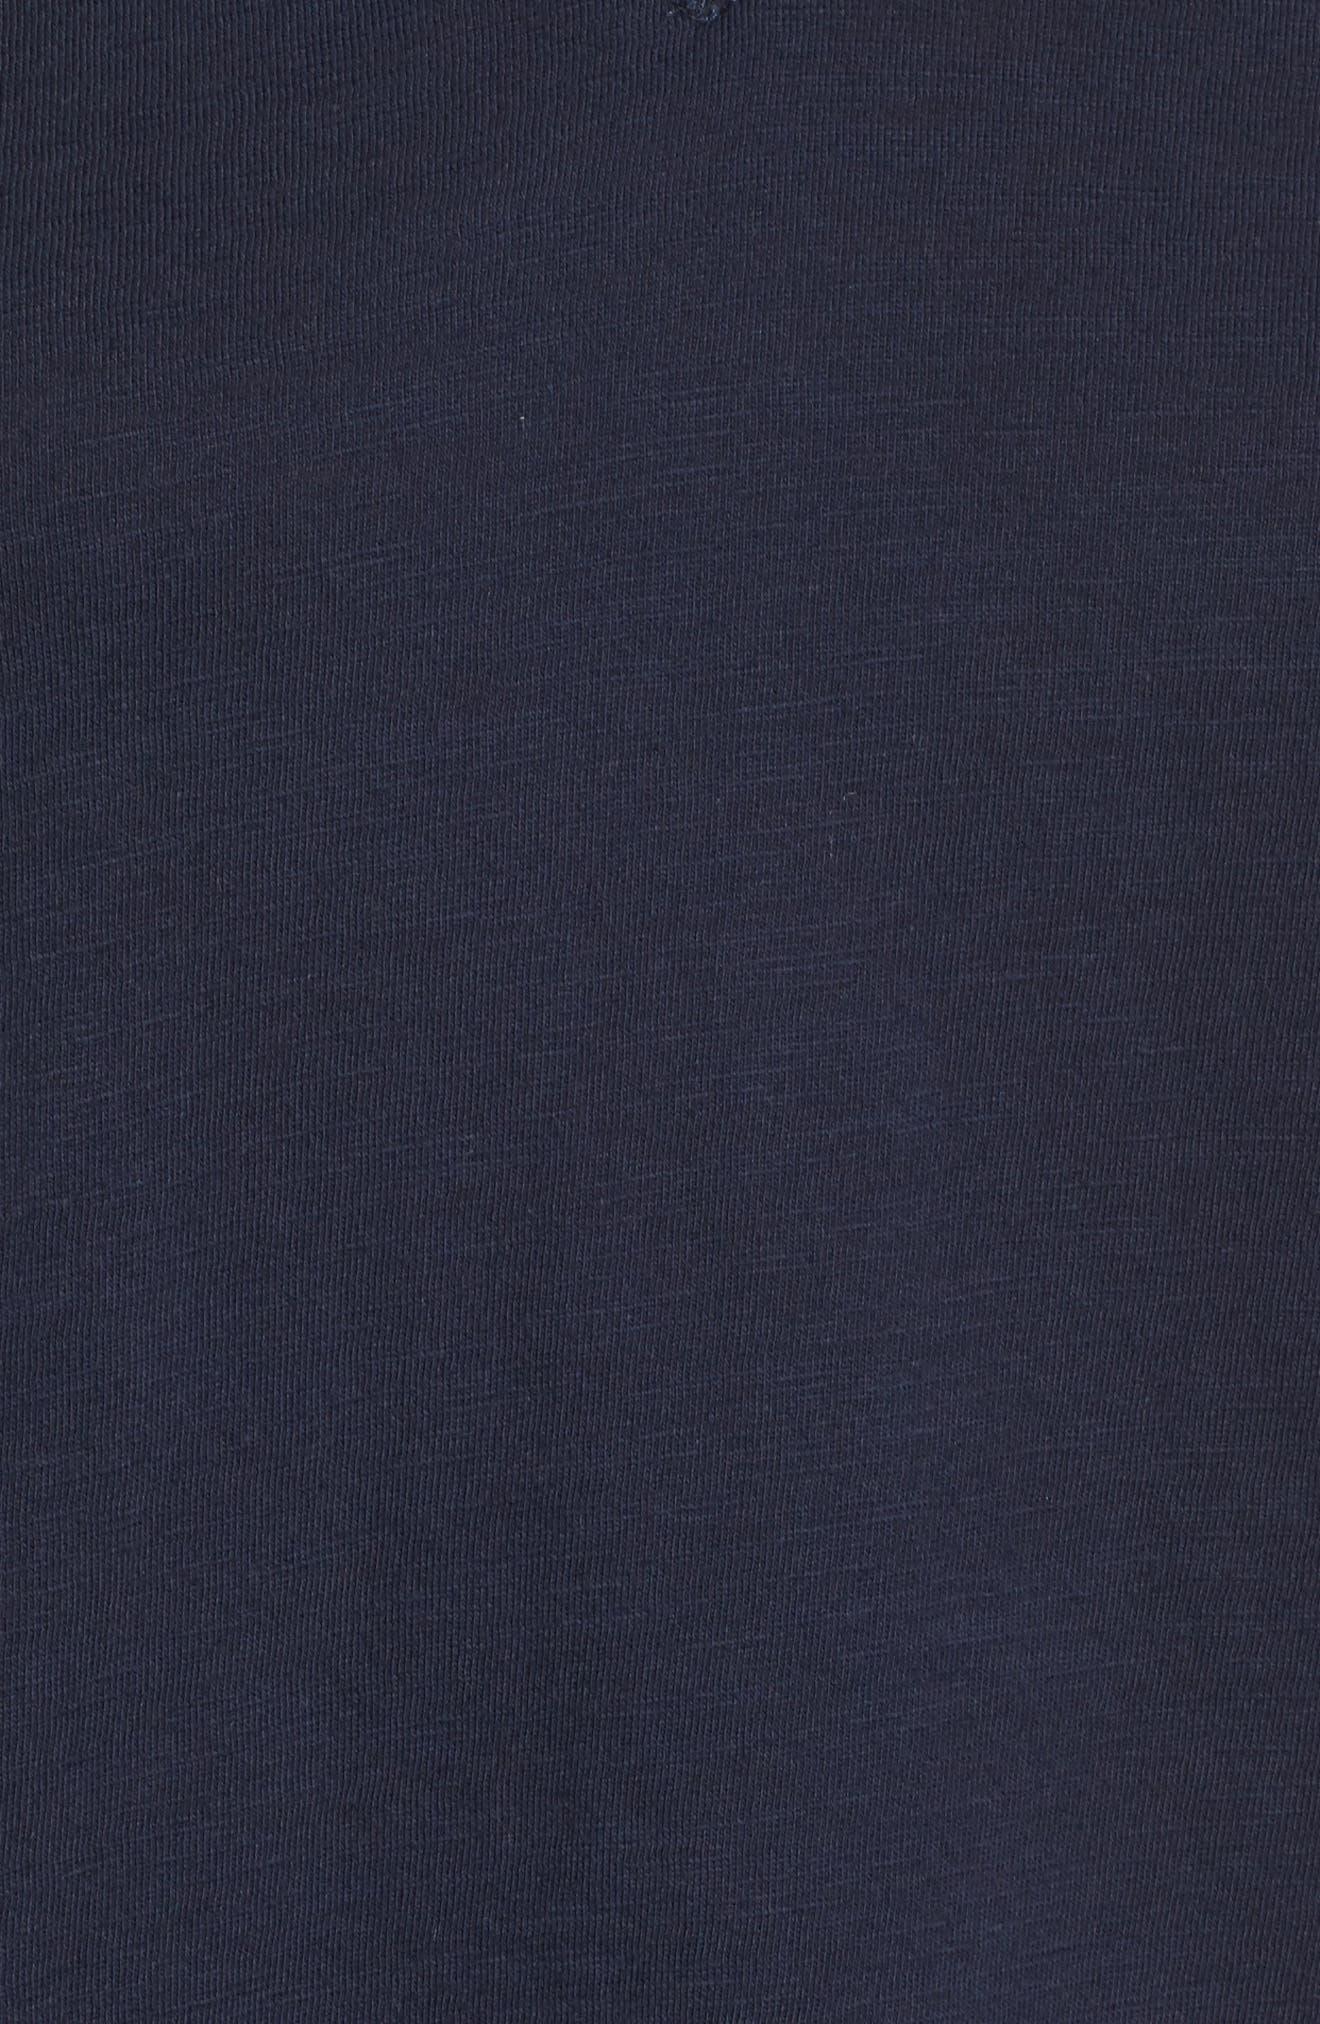 Organic Cotton V-Neck Tee,                             Alternate thumbnail 36, color,